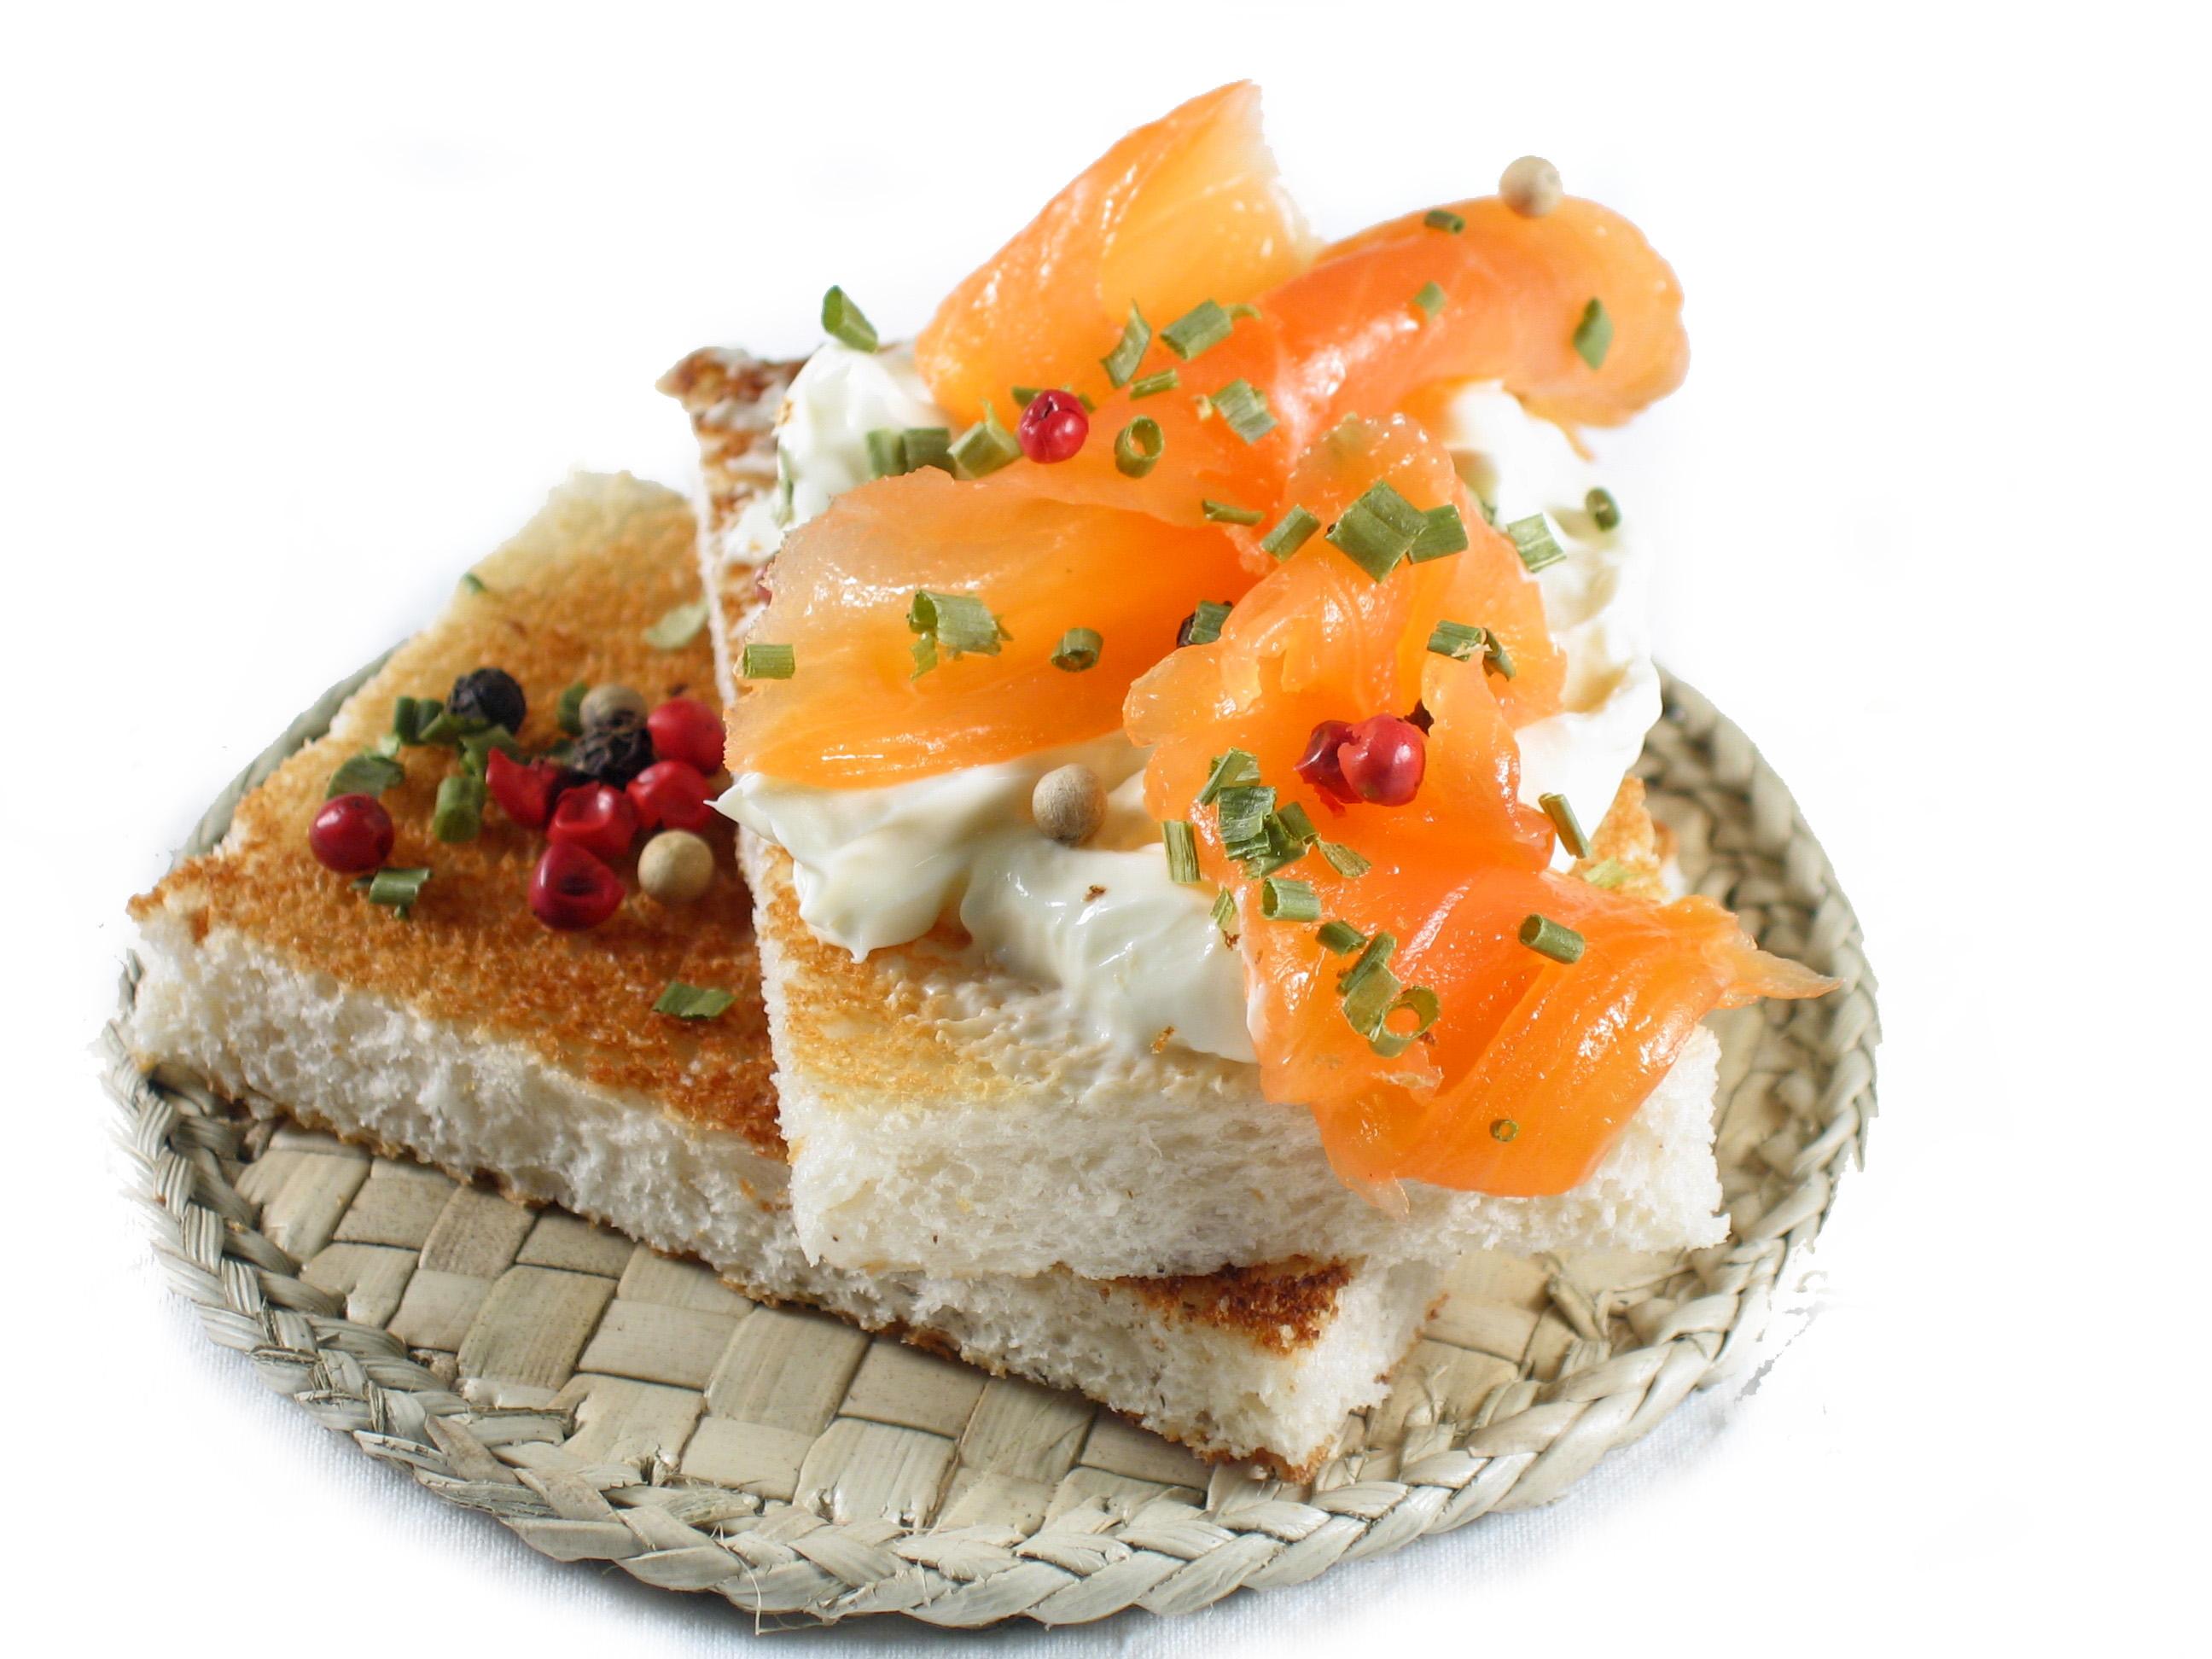 Tostadas de pan con queso crema y salmón ahumado